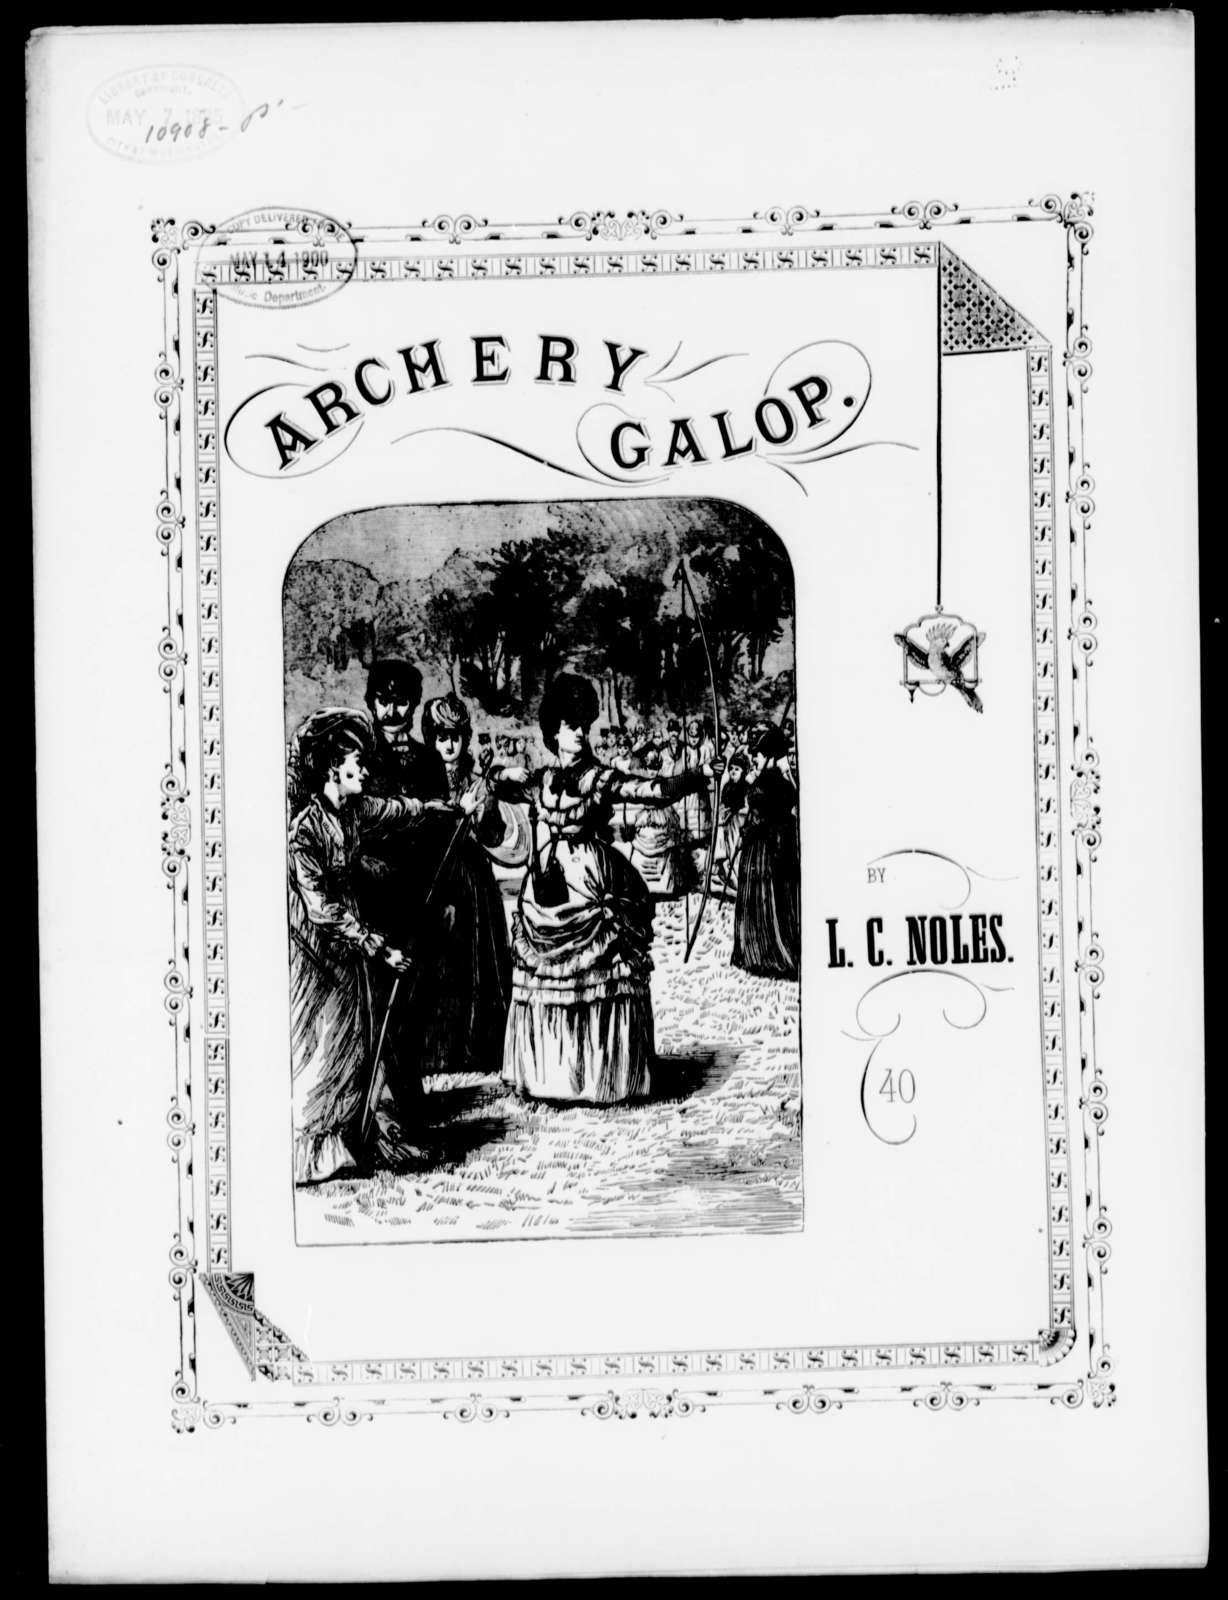 Archery galop